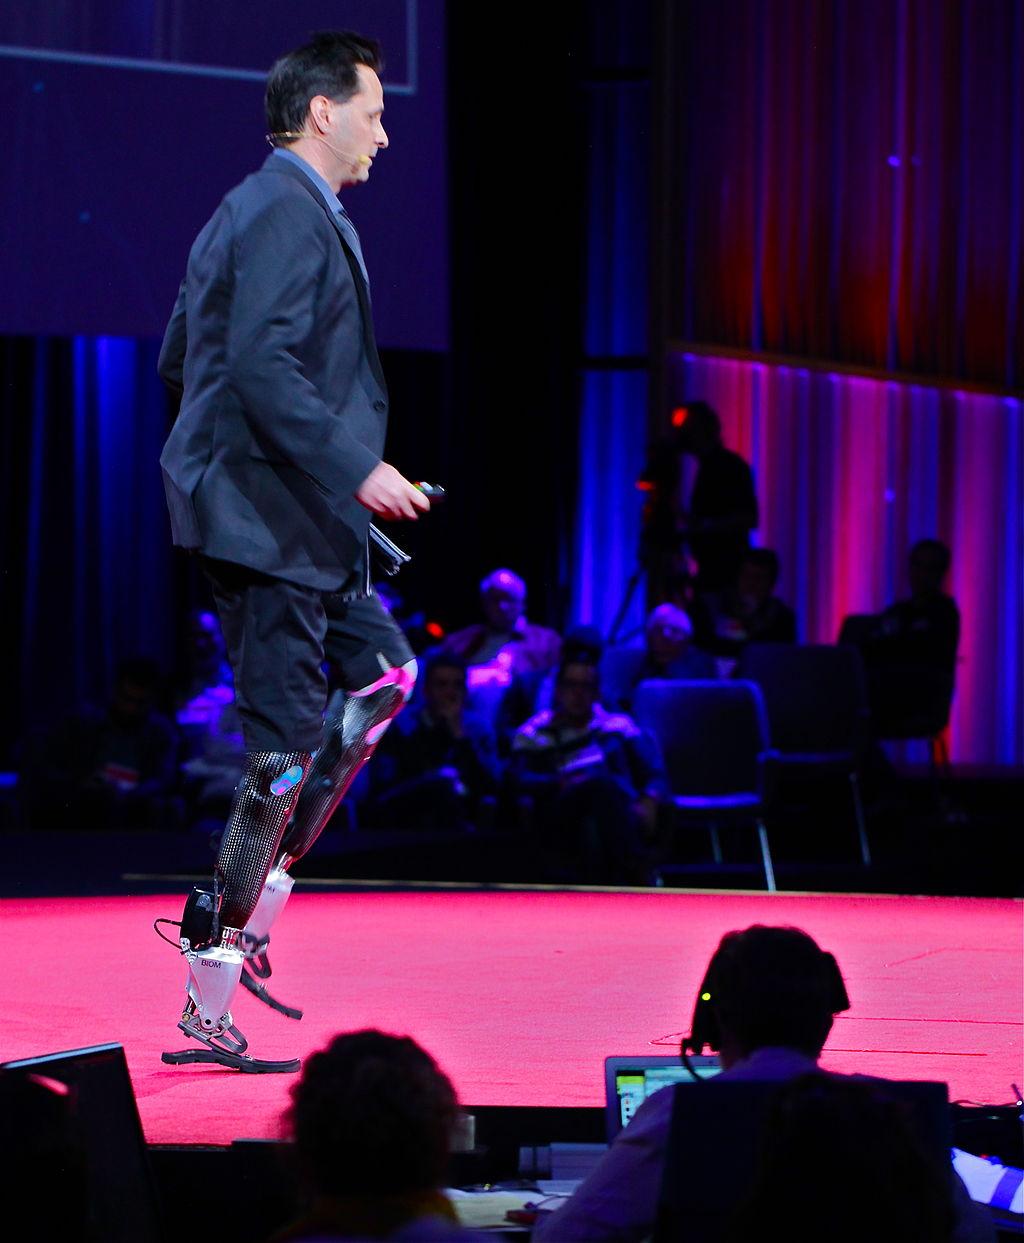 Hugh Herr at his Ted Talk in 2014. Image Credit: Steve Jurvetson, Wikimedia